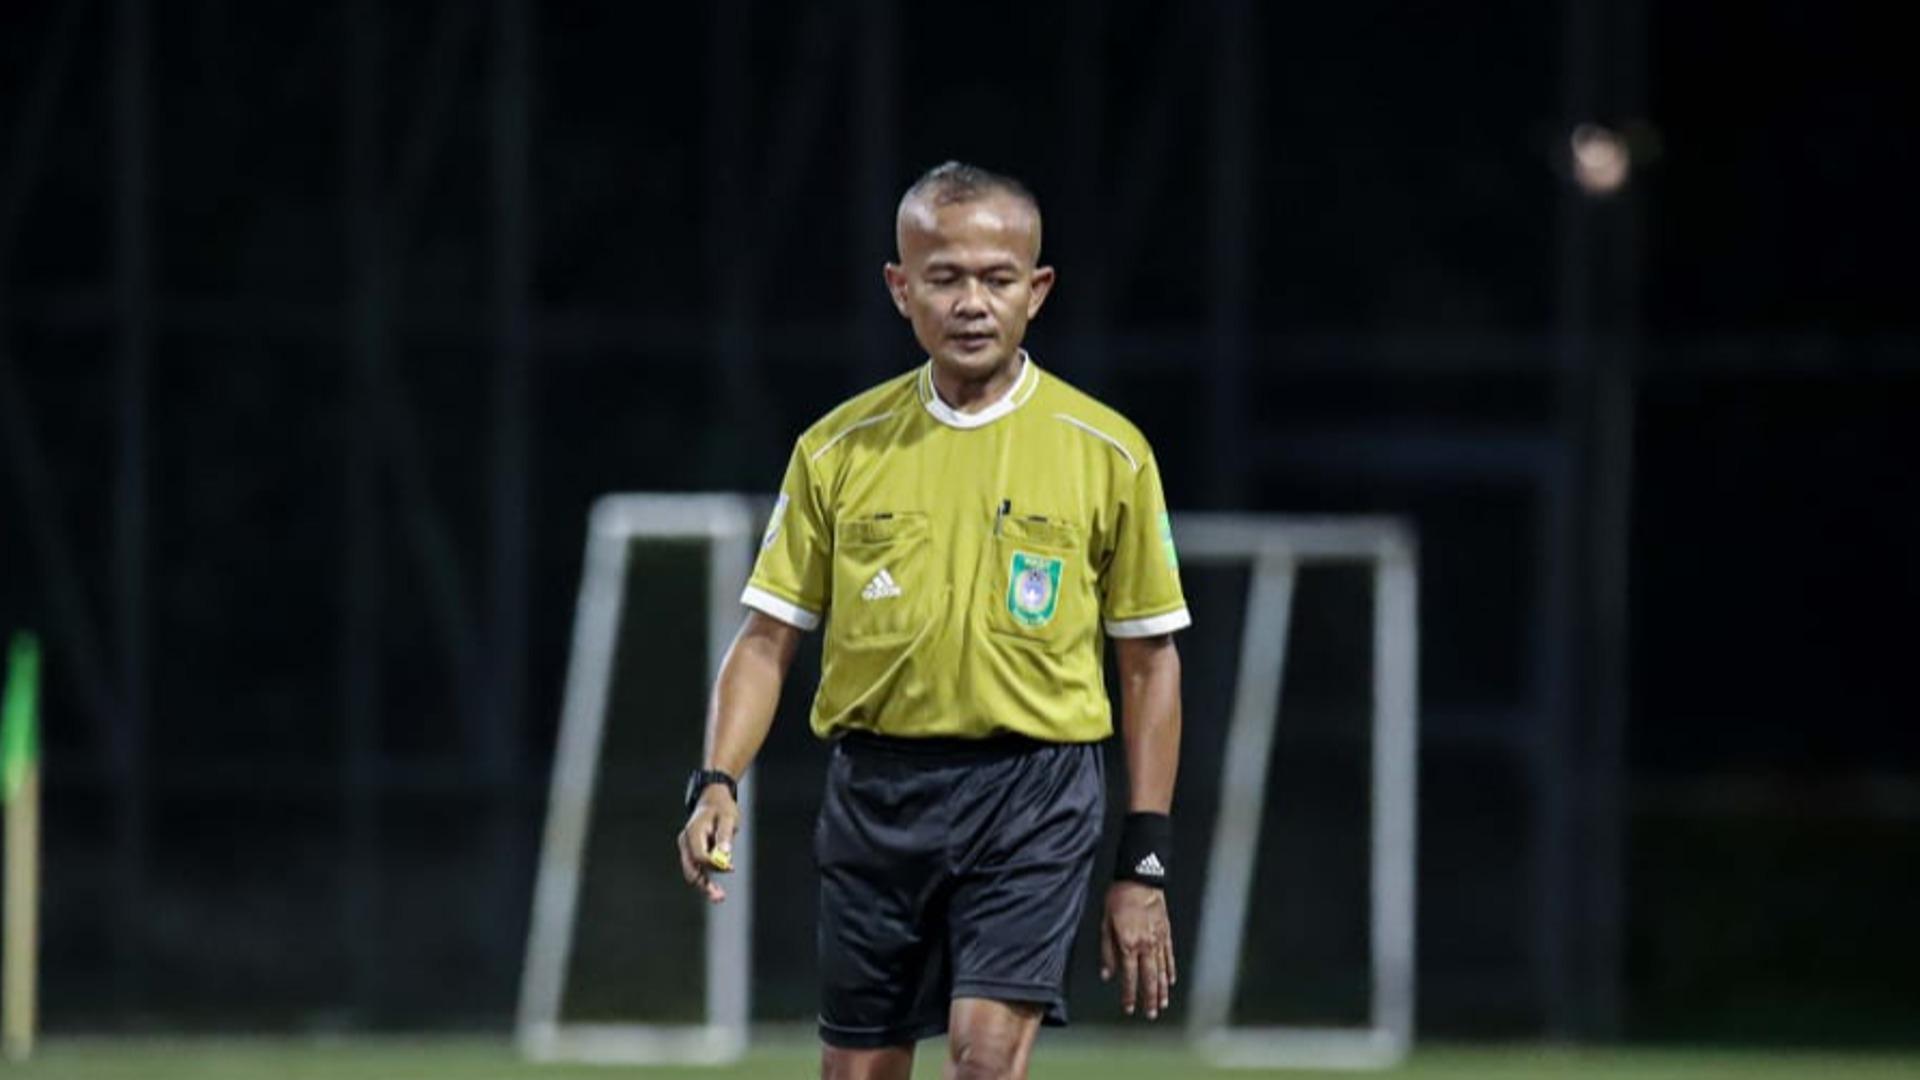 Referee Reza Carso